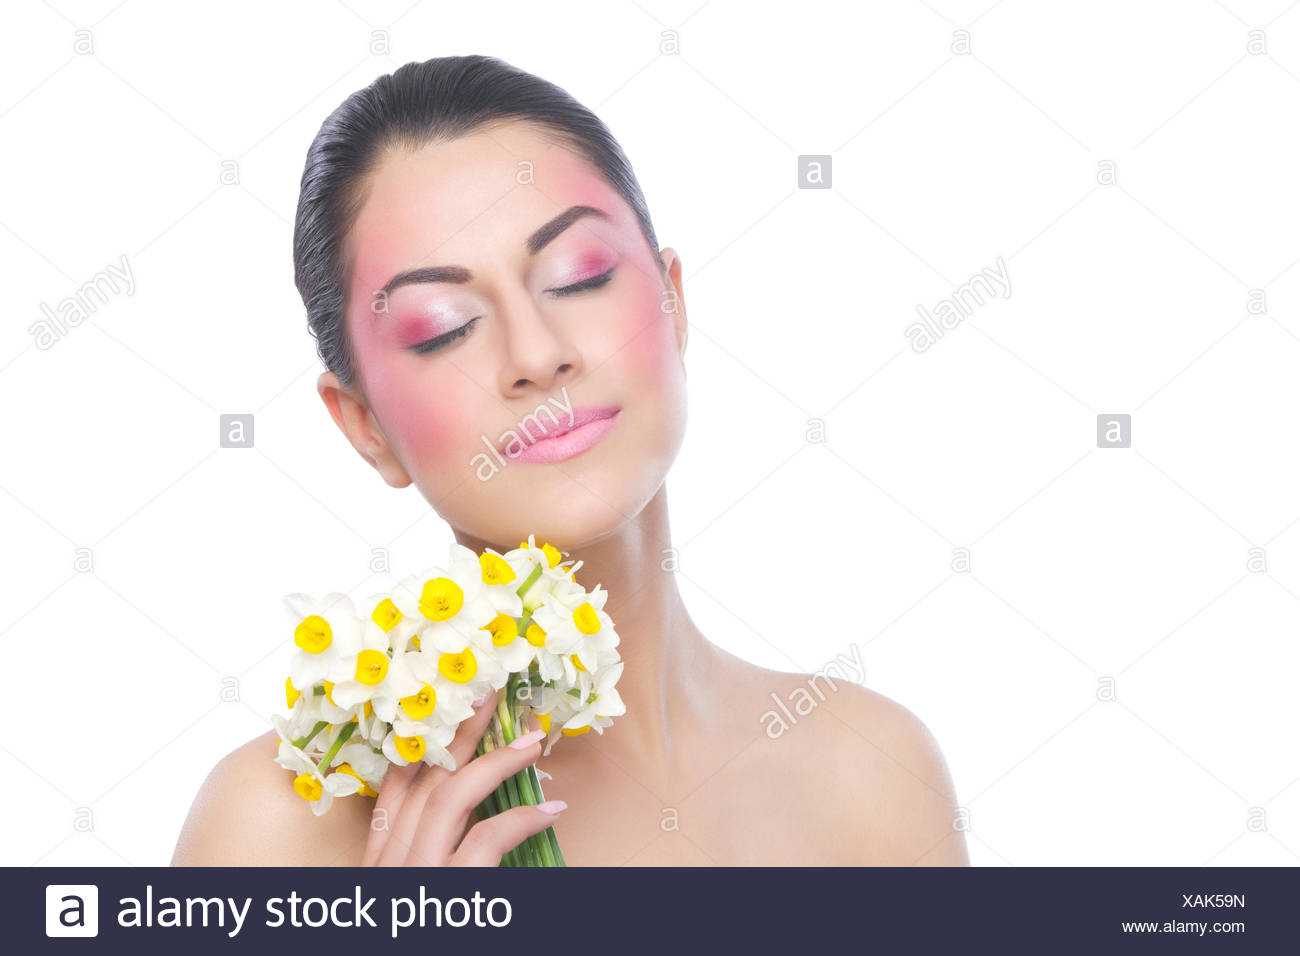 Beautiful woman with flowers stock photo 281933729 alamy beautiful woman with flowers izmirmasajfo